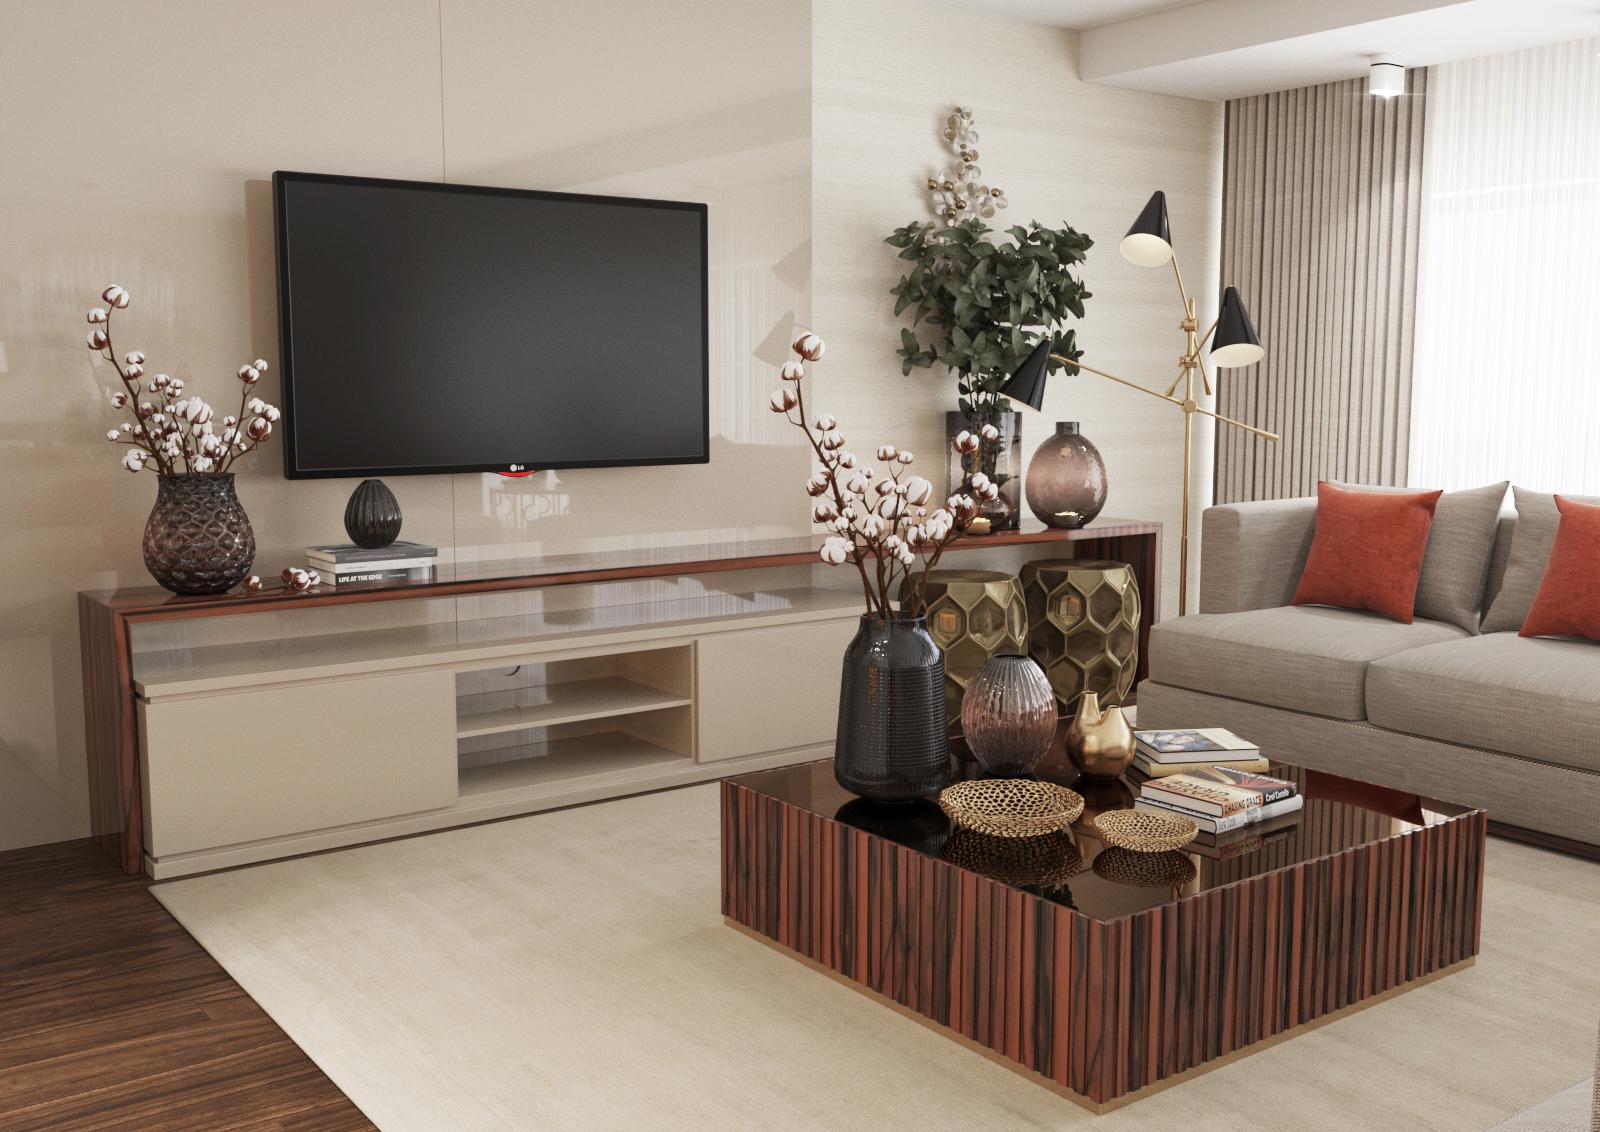 Sala de estar + jantar + hall de entrada (3) (1).jpg